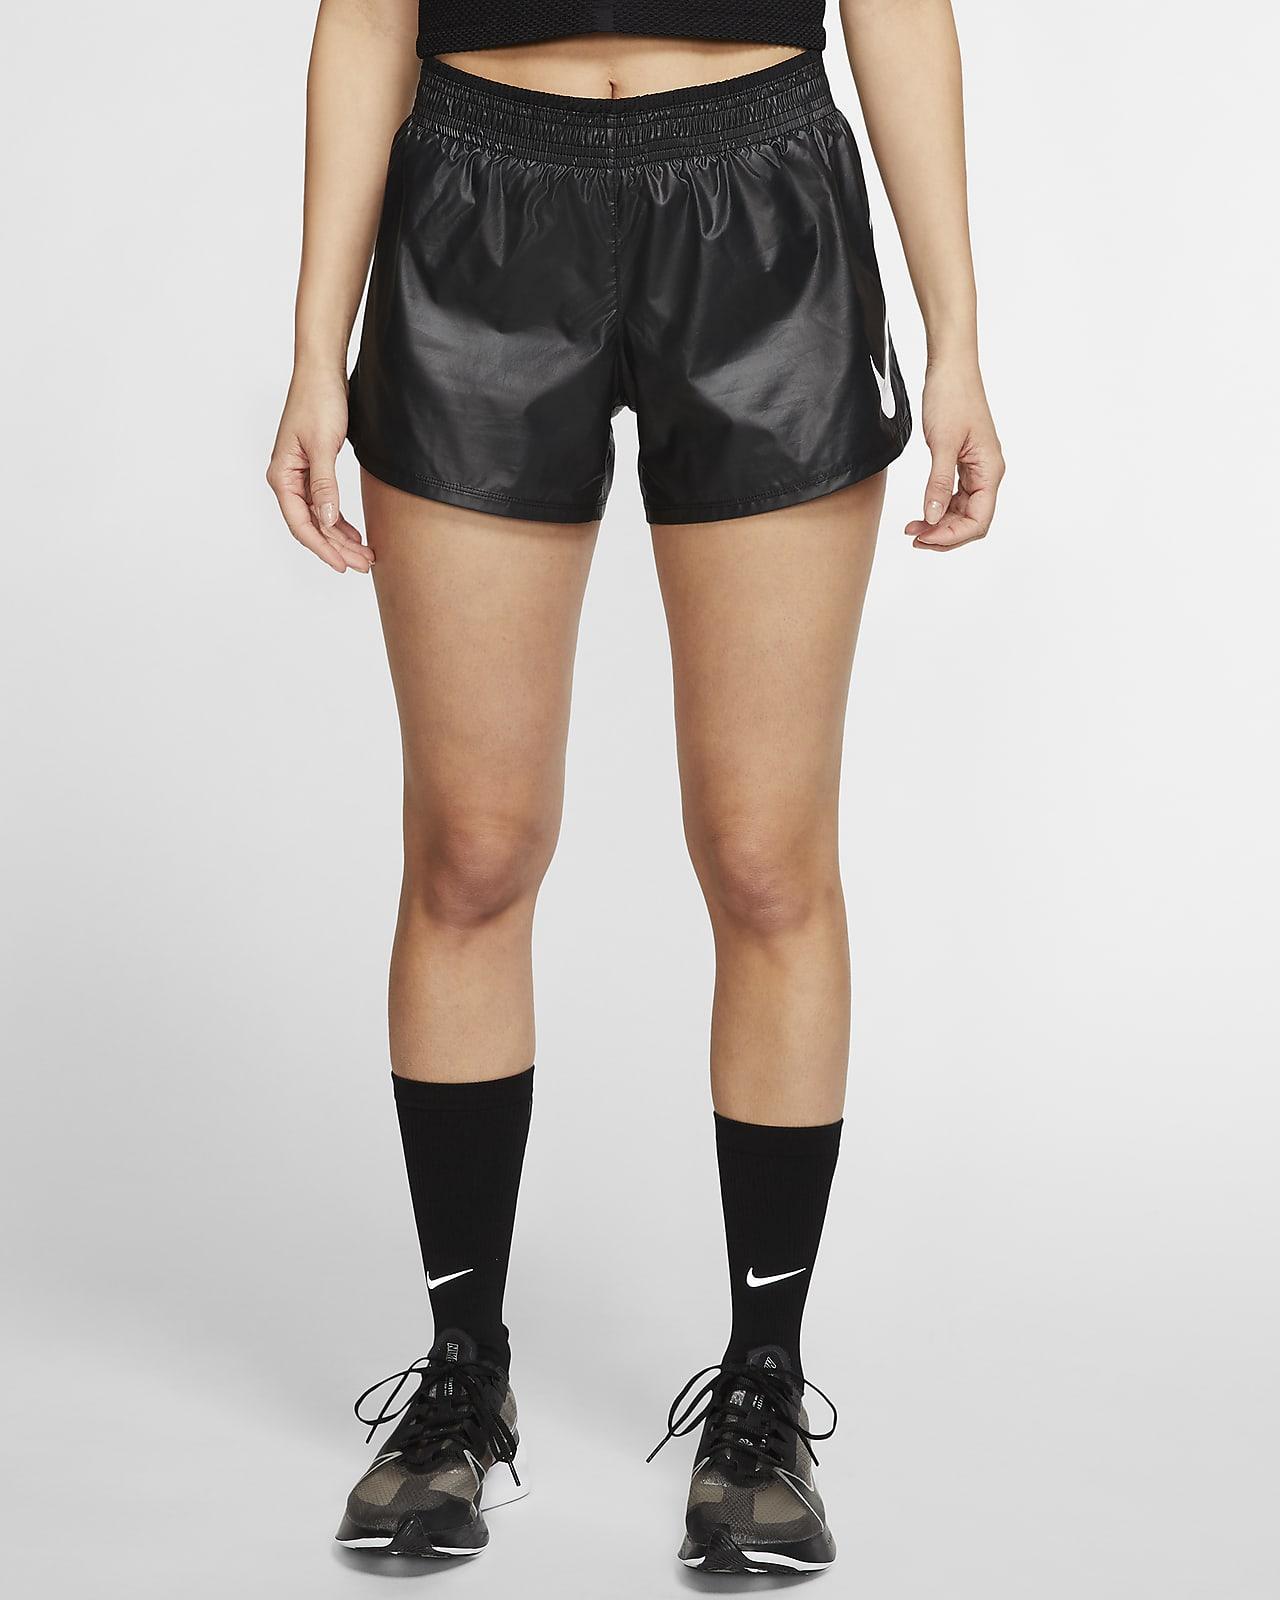 Short de running Nike pour Femme